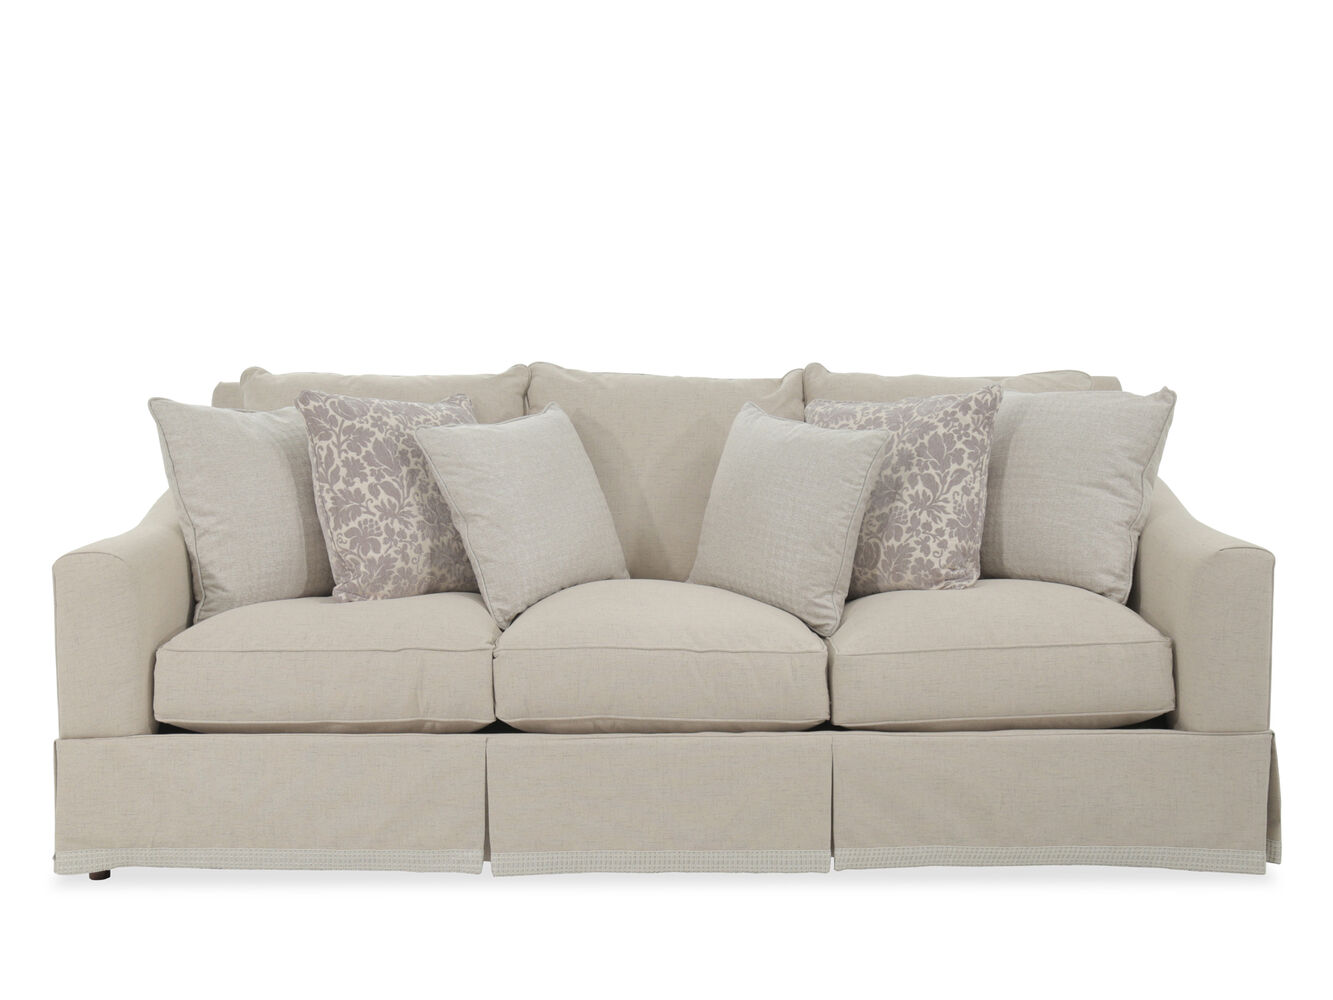 Broyhill Regina Fabric Sofa | Mathis Brothers Furniture